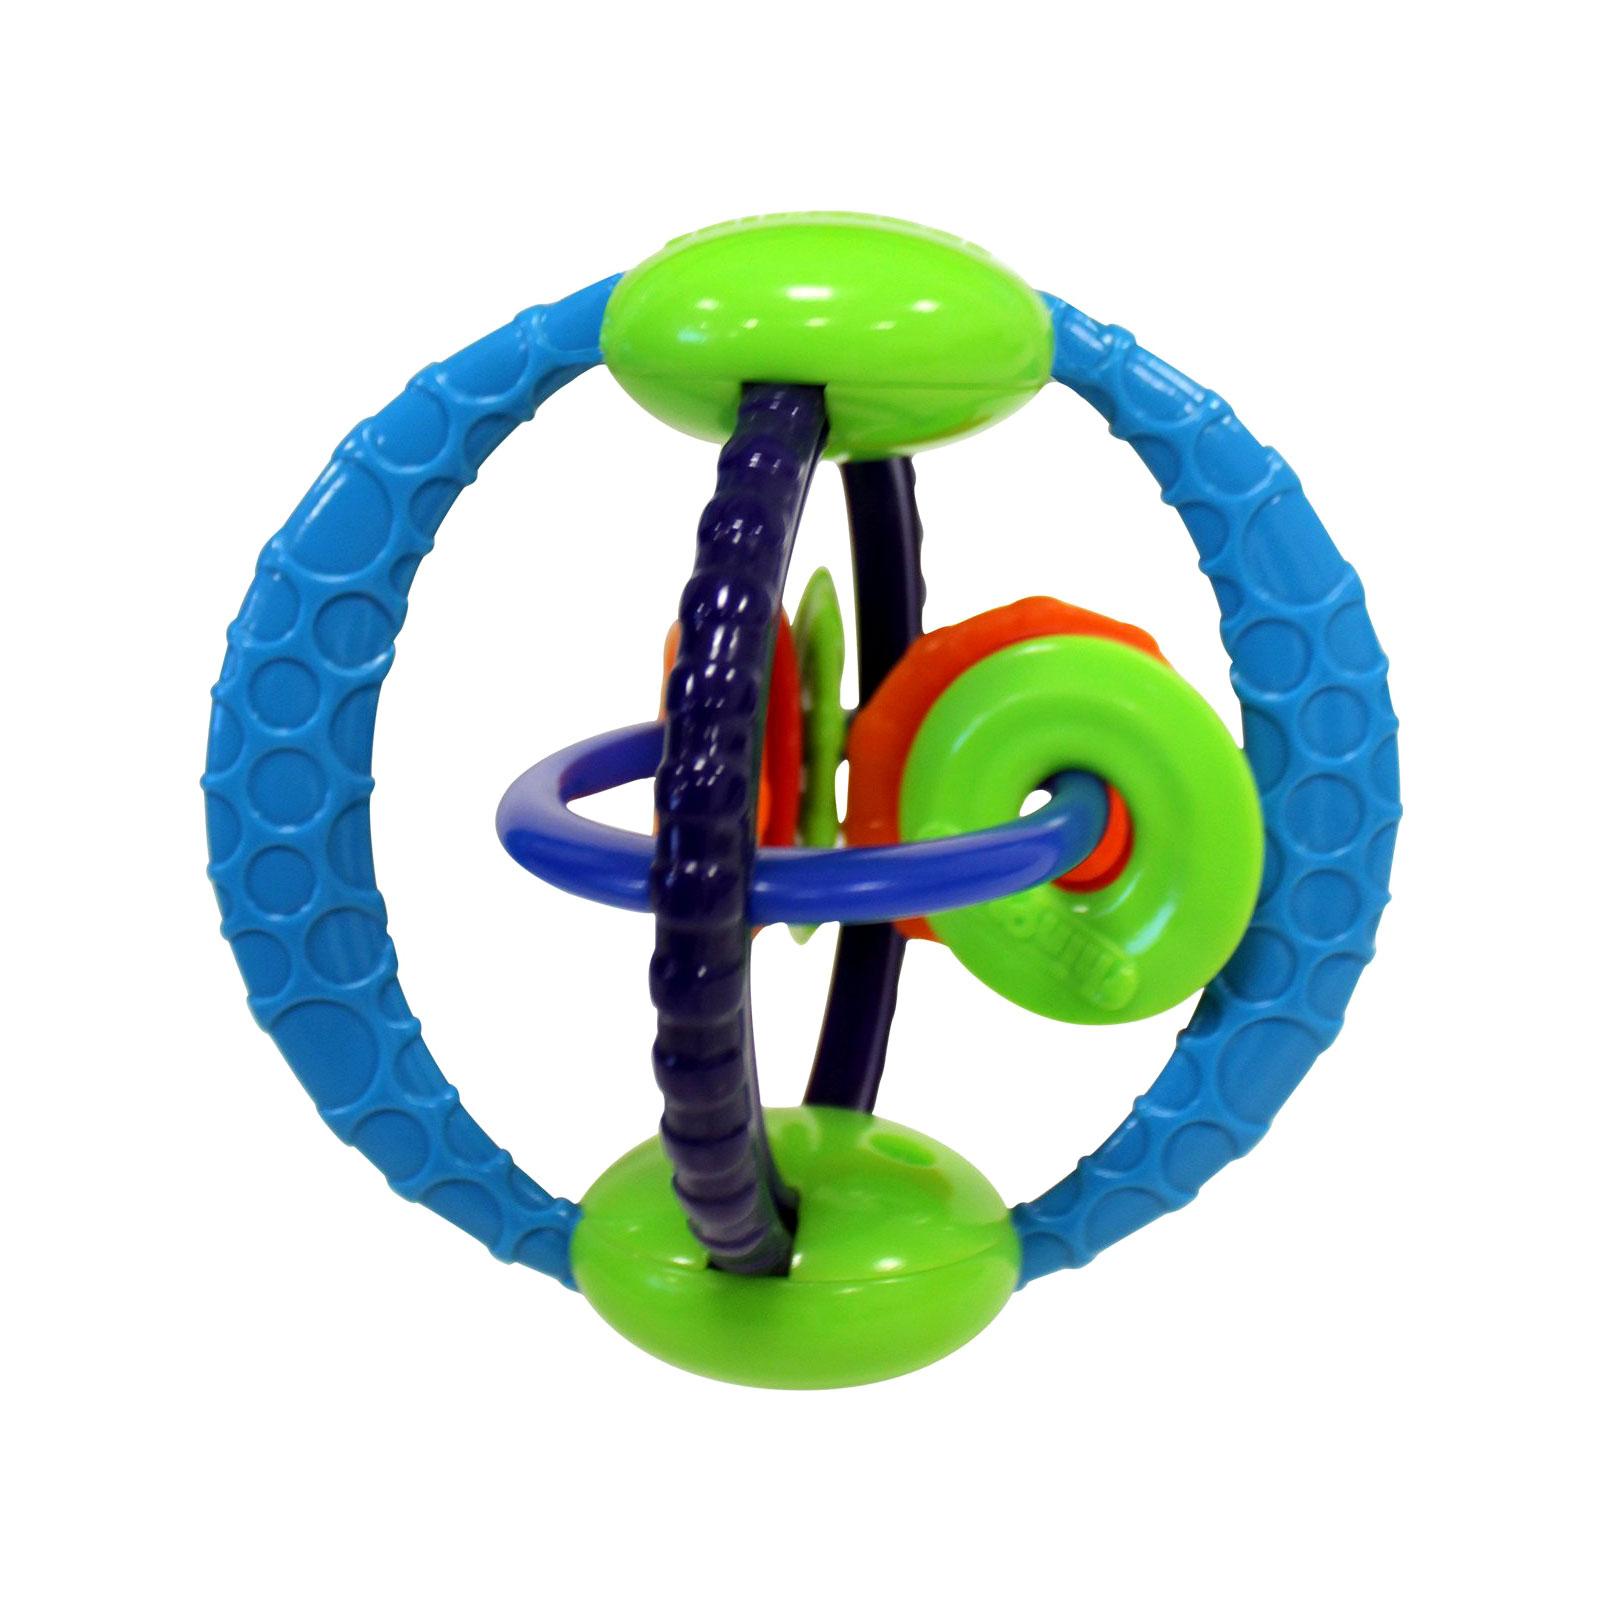 ����������� ������� Rhino Toys Oball Twist-O-Round � 0 ���. (11 ��.)